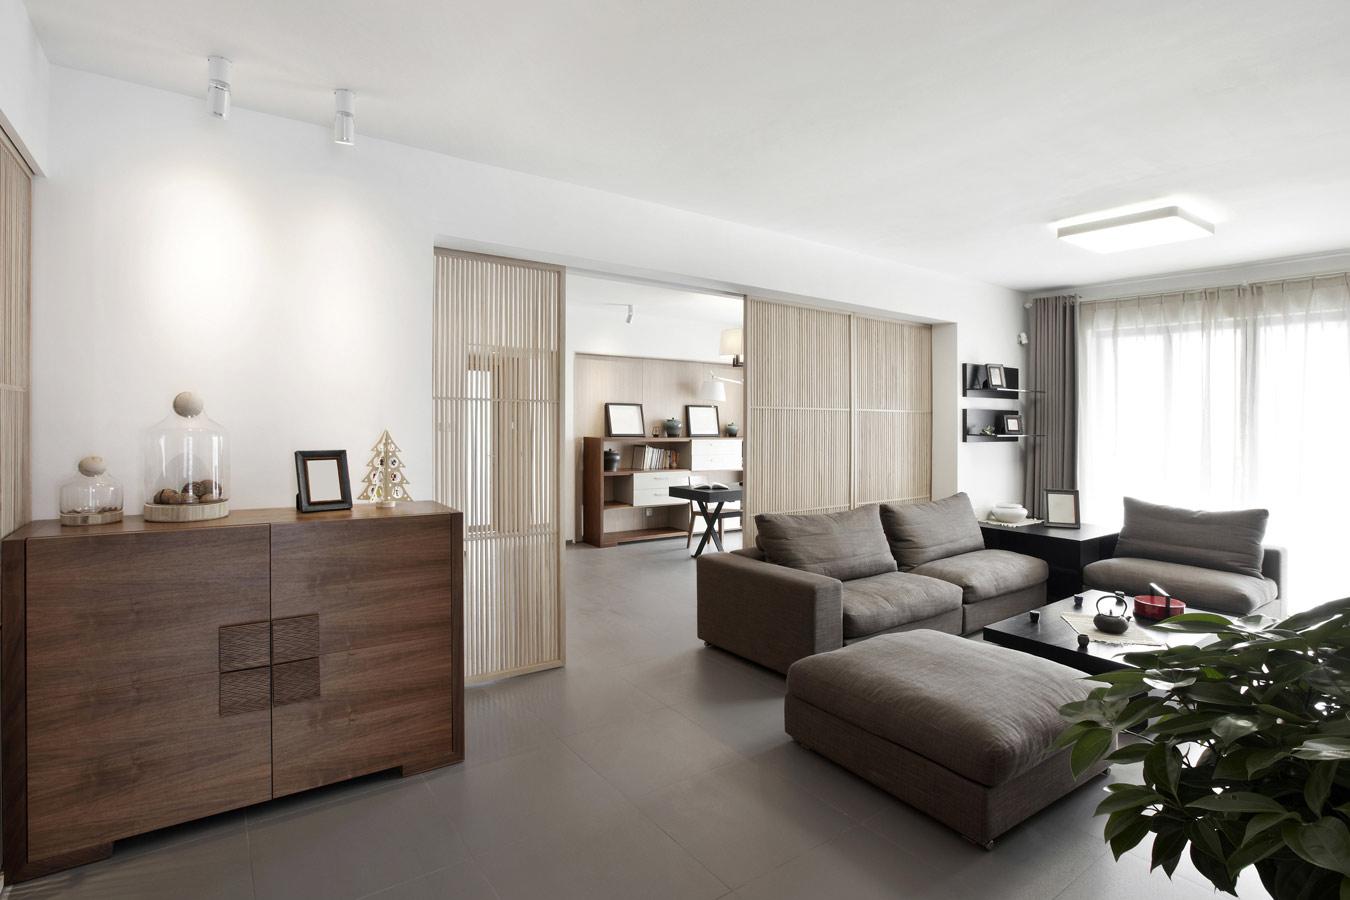 Witte Keuken Grijze Vloer : Grijze vloertegels woonkamer : Vloertegel ...